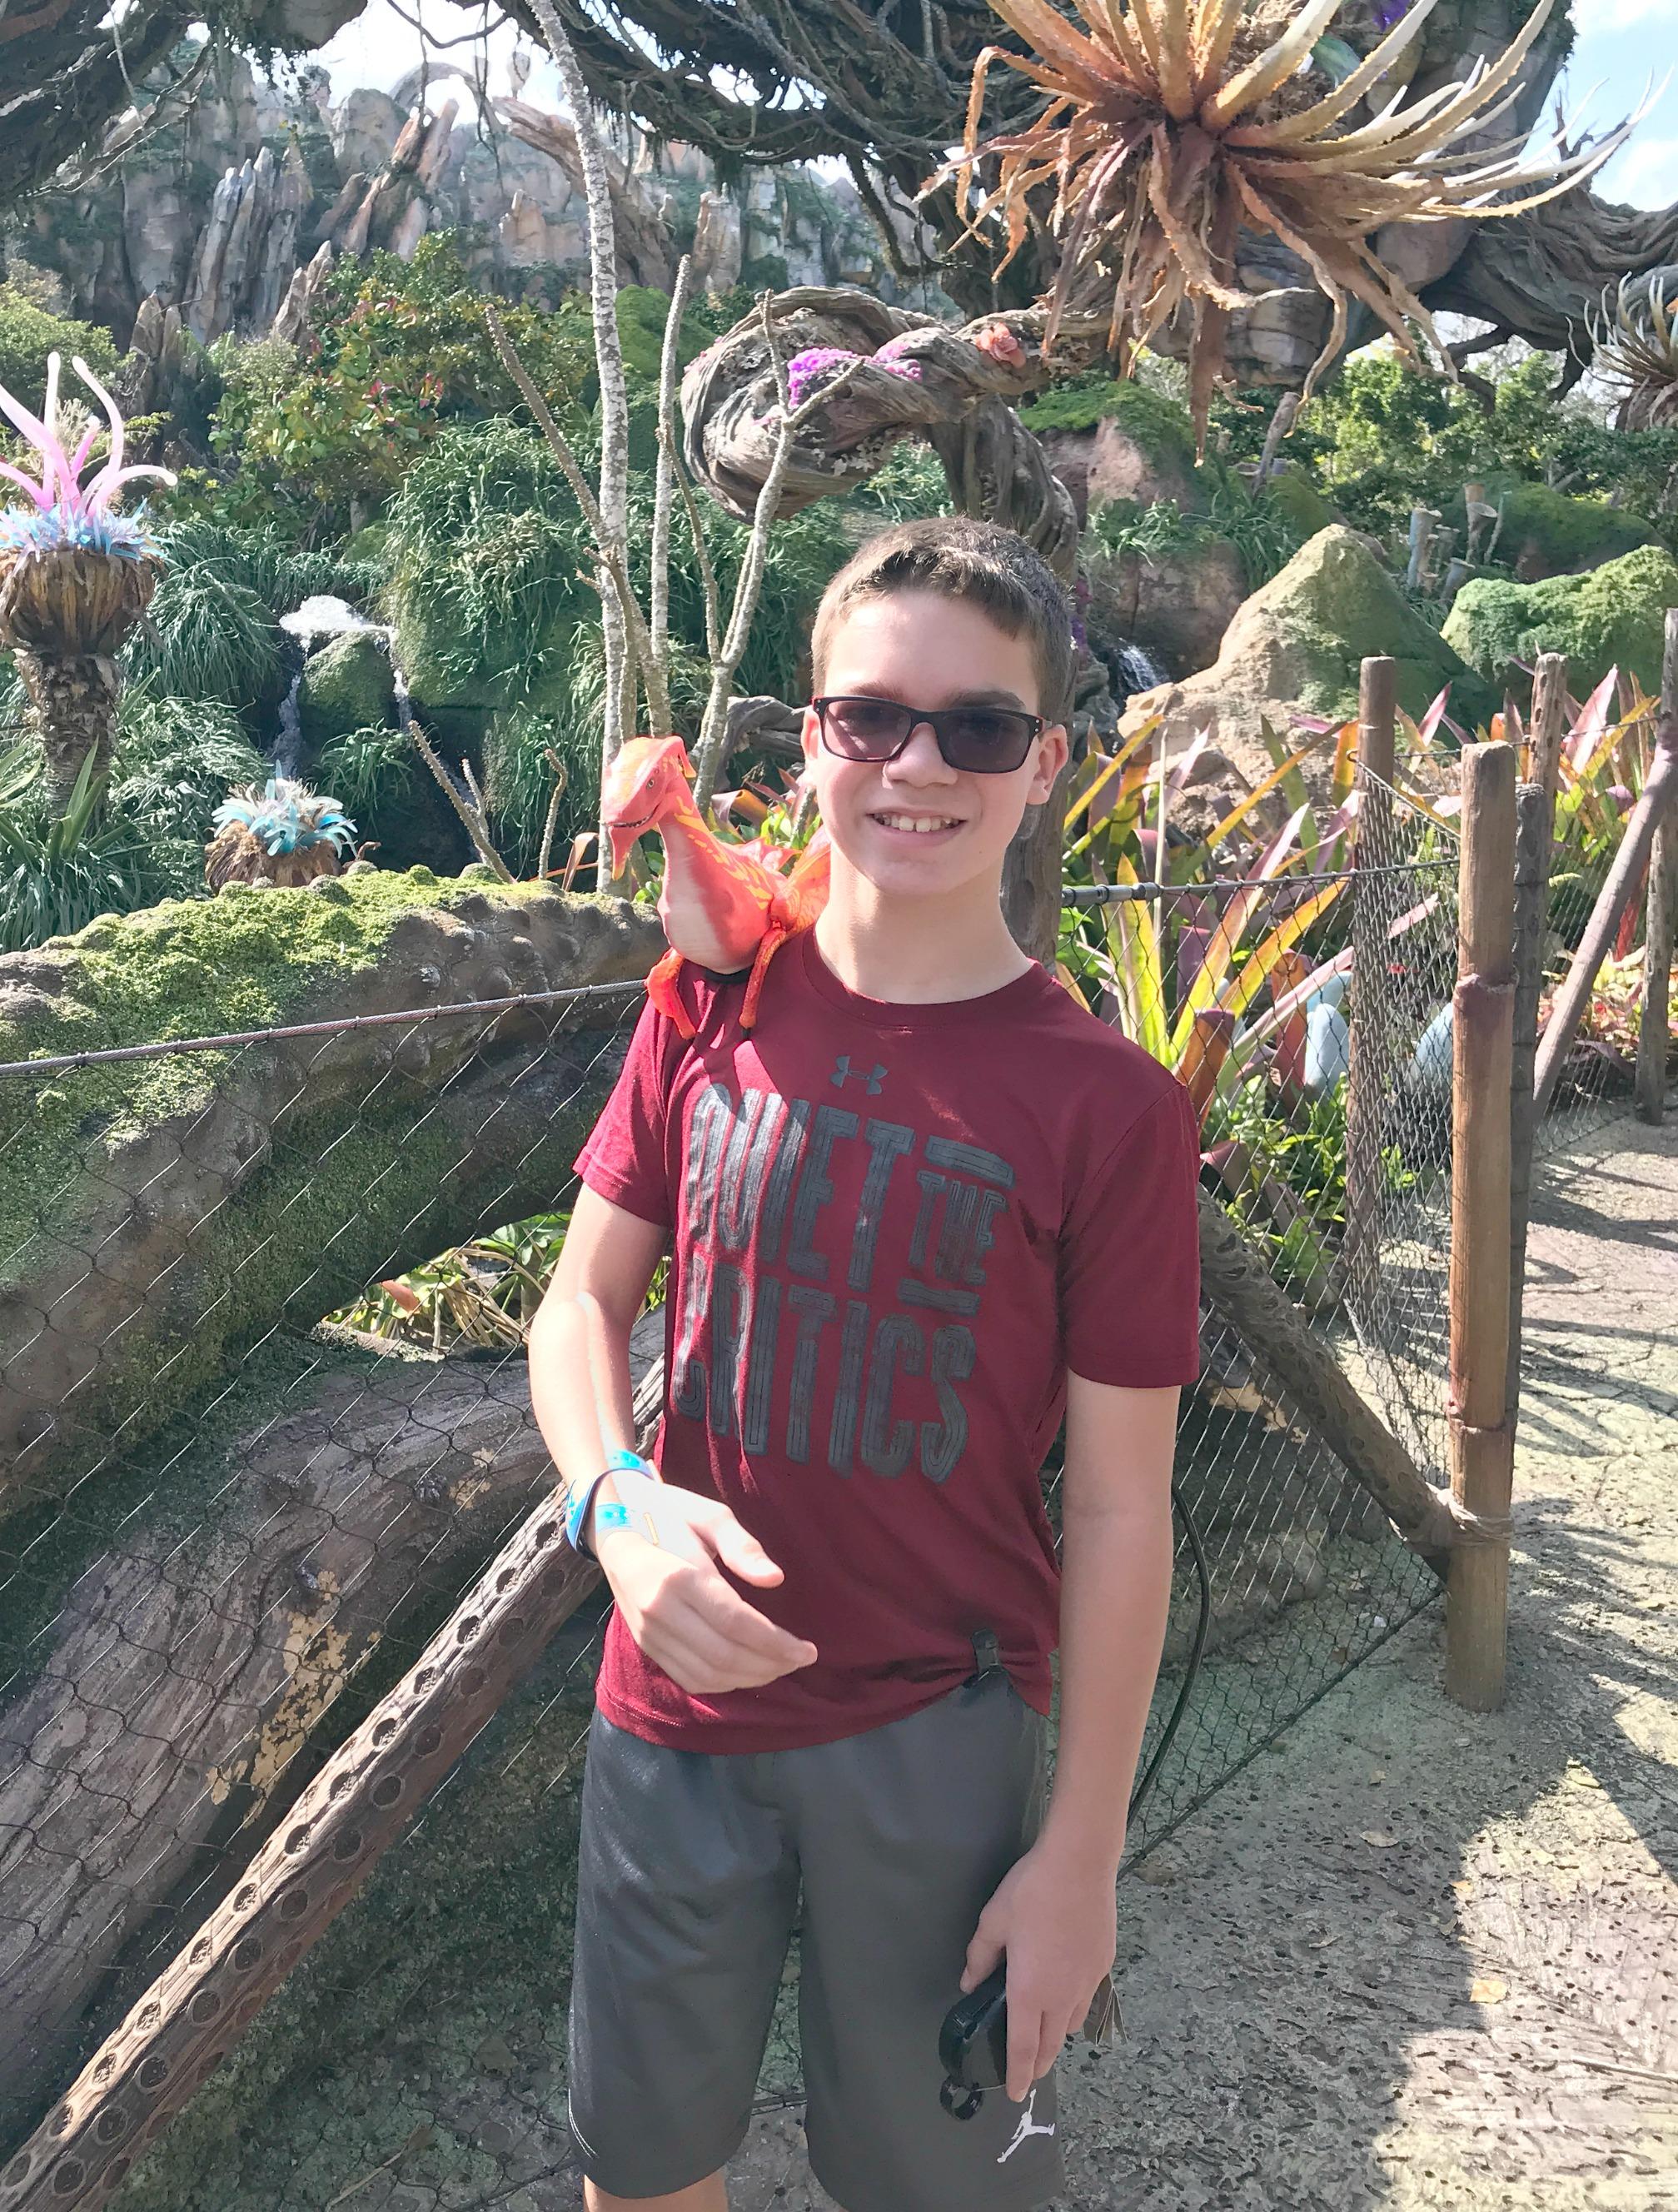 Adopt a Banshee Visiting Disney's Pandora